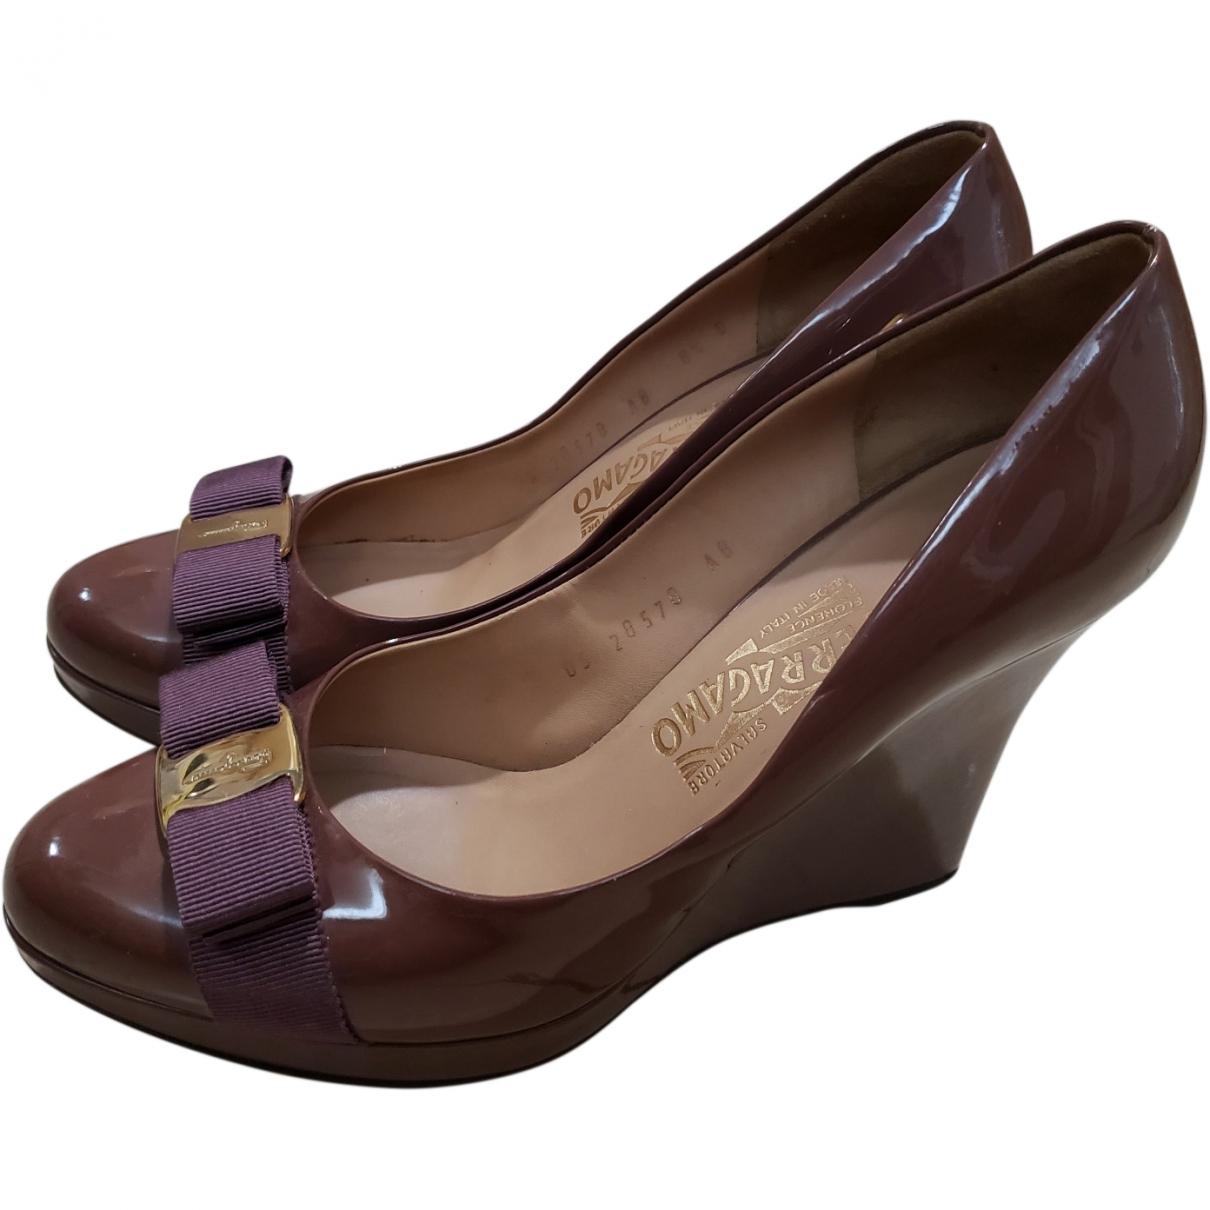 Salvatore Ferragamo \N Purple Patent leather Heels for Women 39 EU